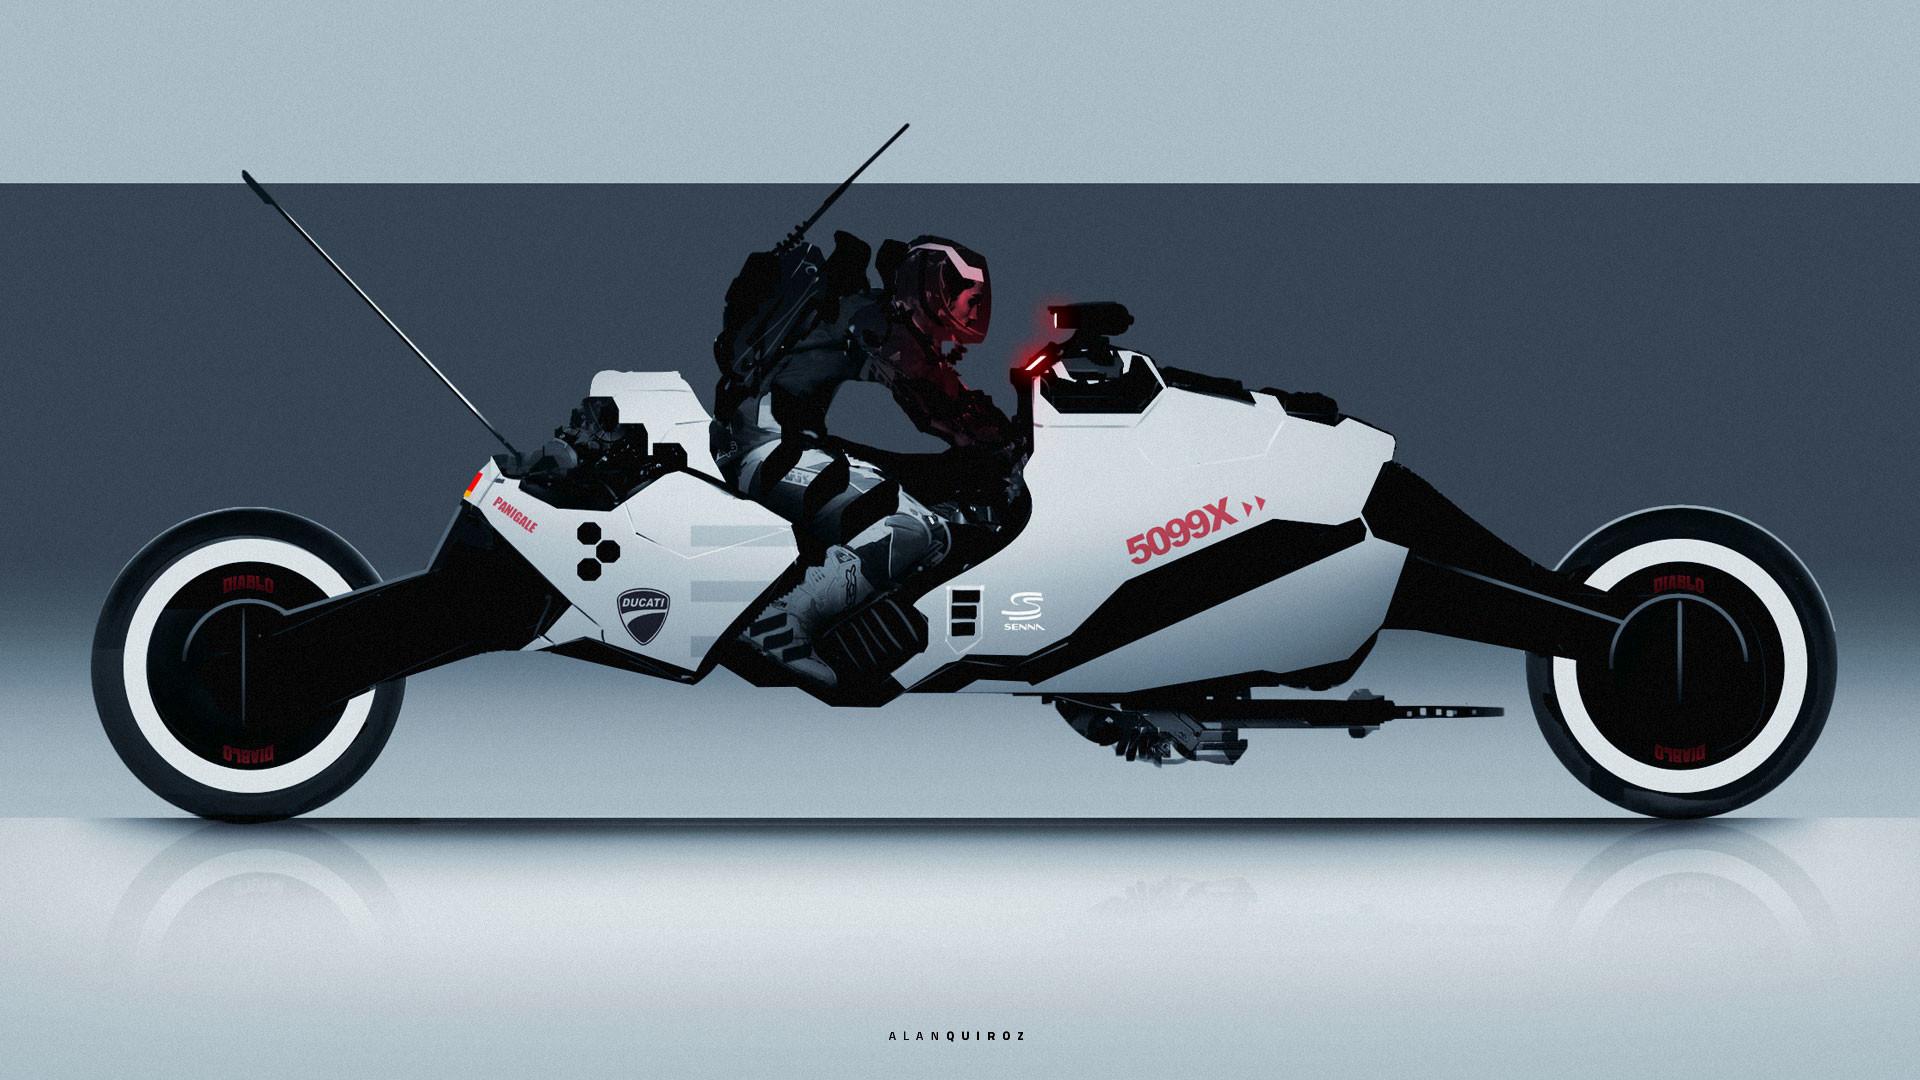 Ducati Panigale Concept